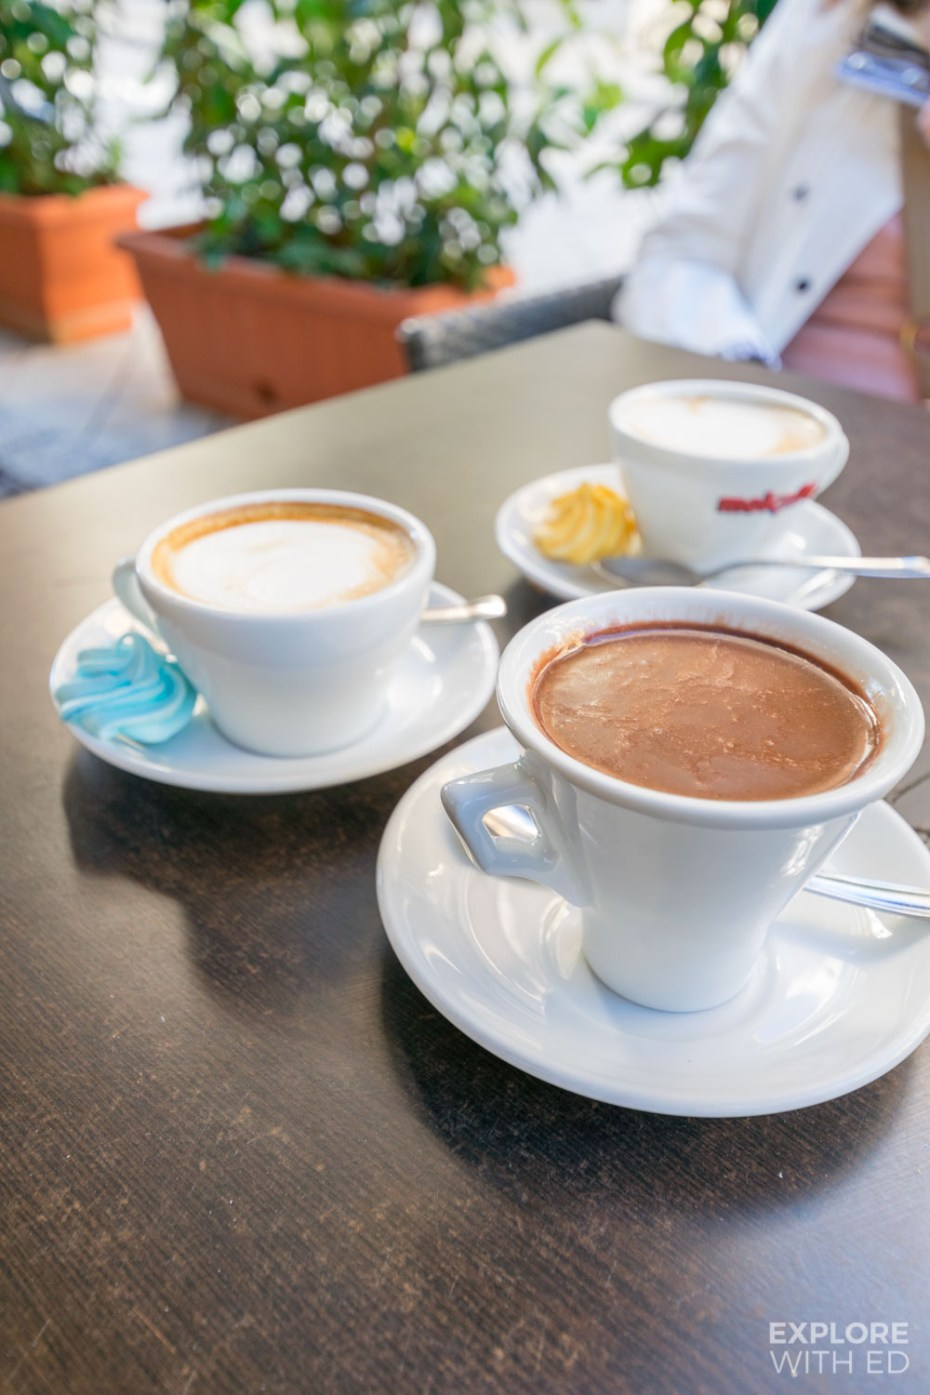 Hot chocolate and coffee al fresco in Brindisi